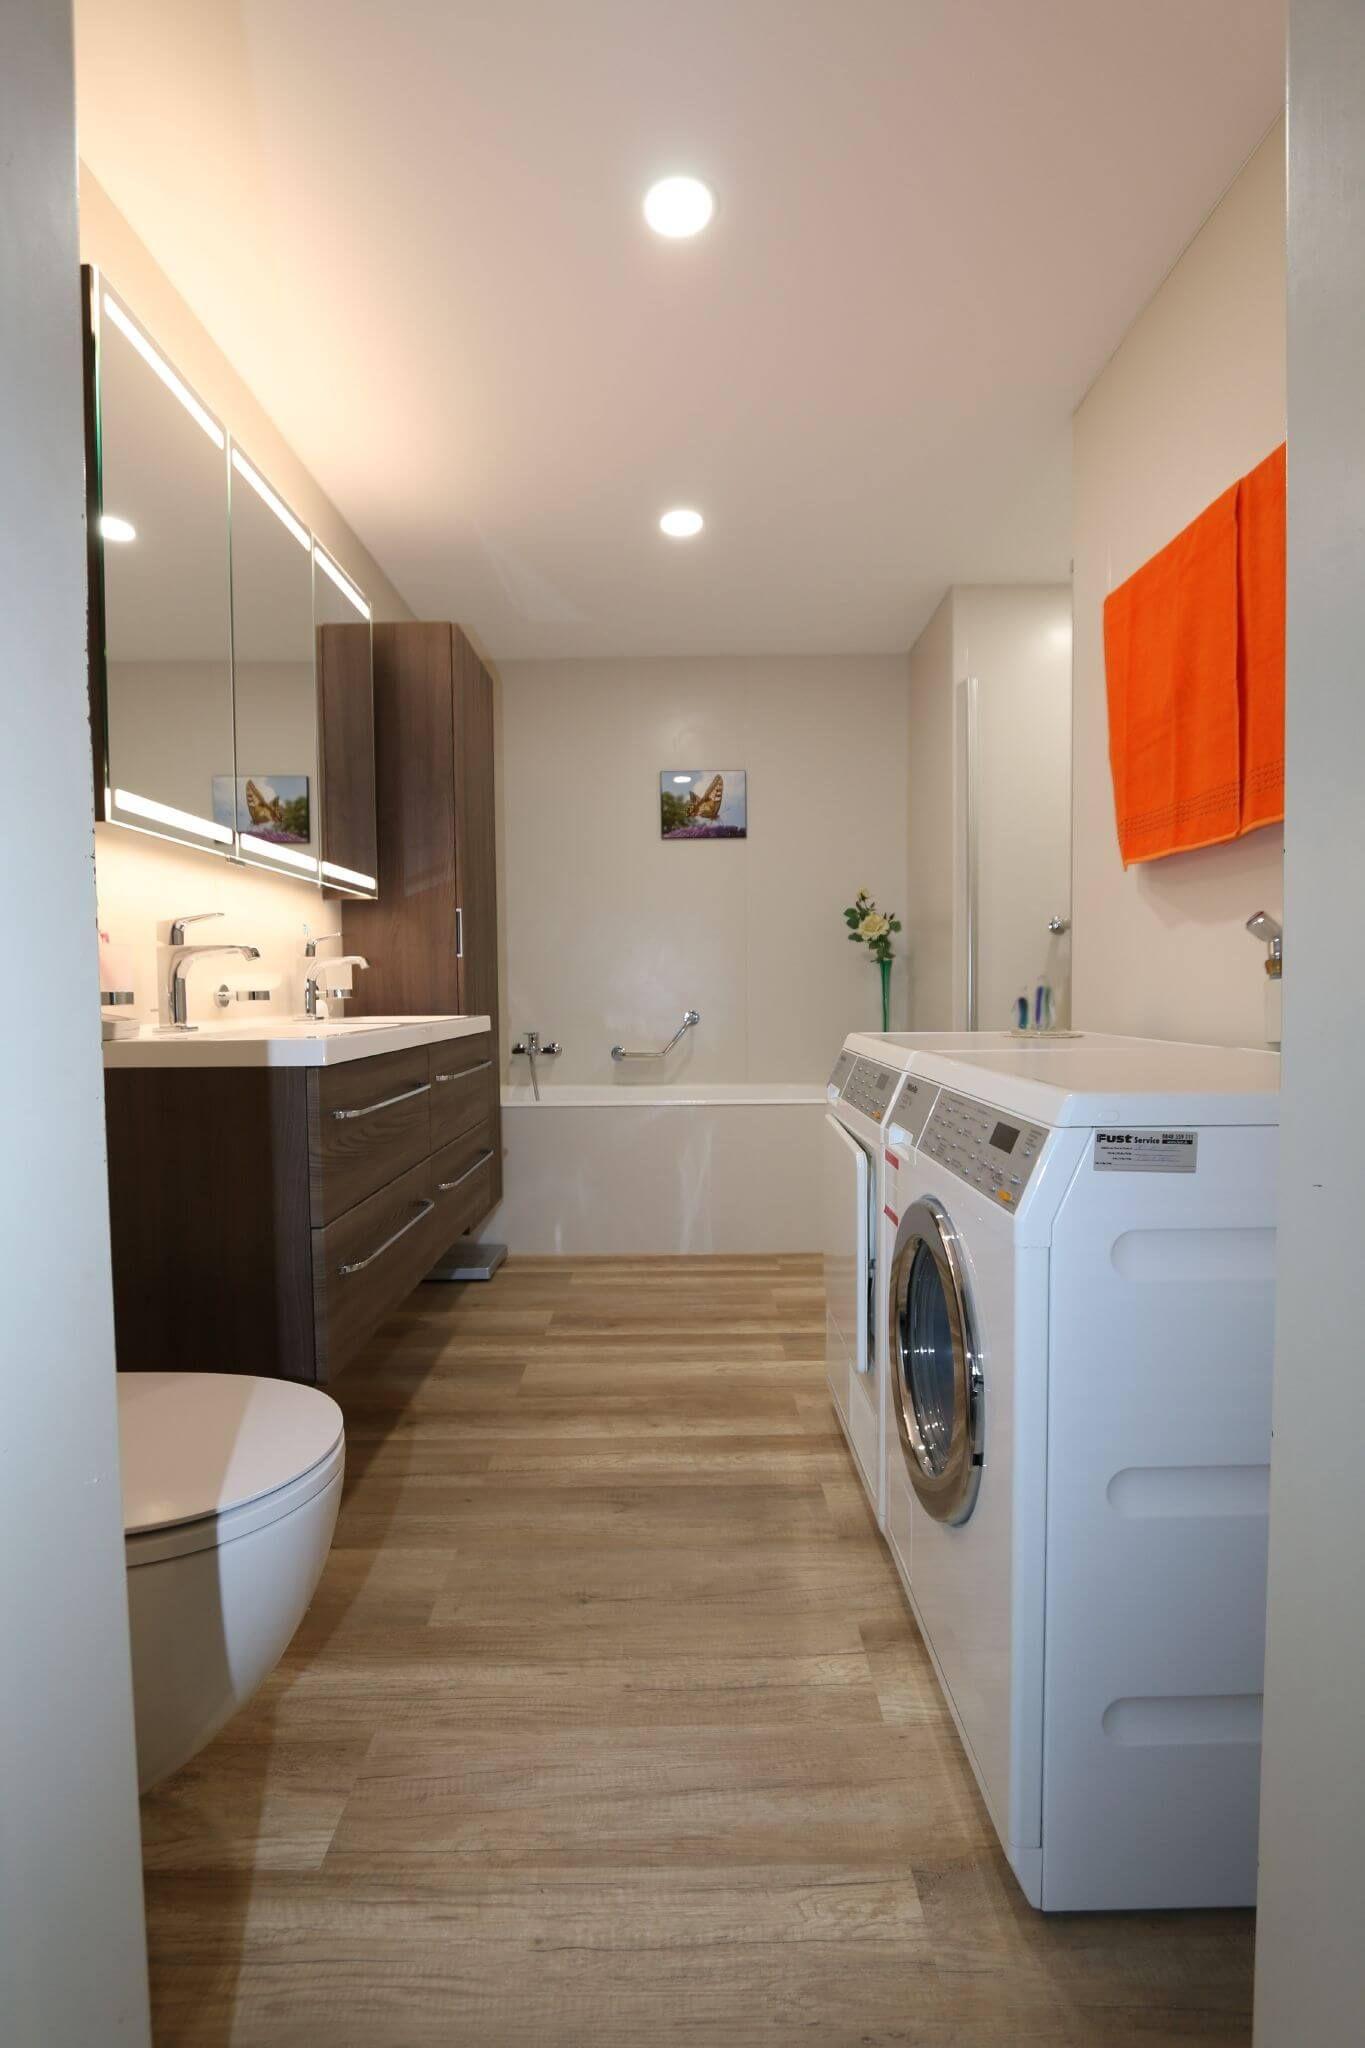 Viterma 24h Badsanierung Bei Familie Helg Badezimmereinrichtung Badsanierung Sanierung